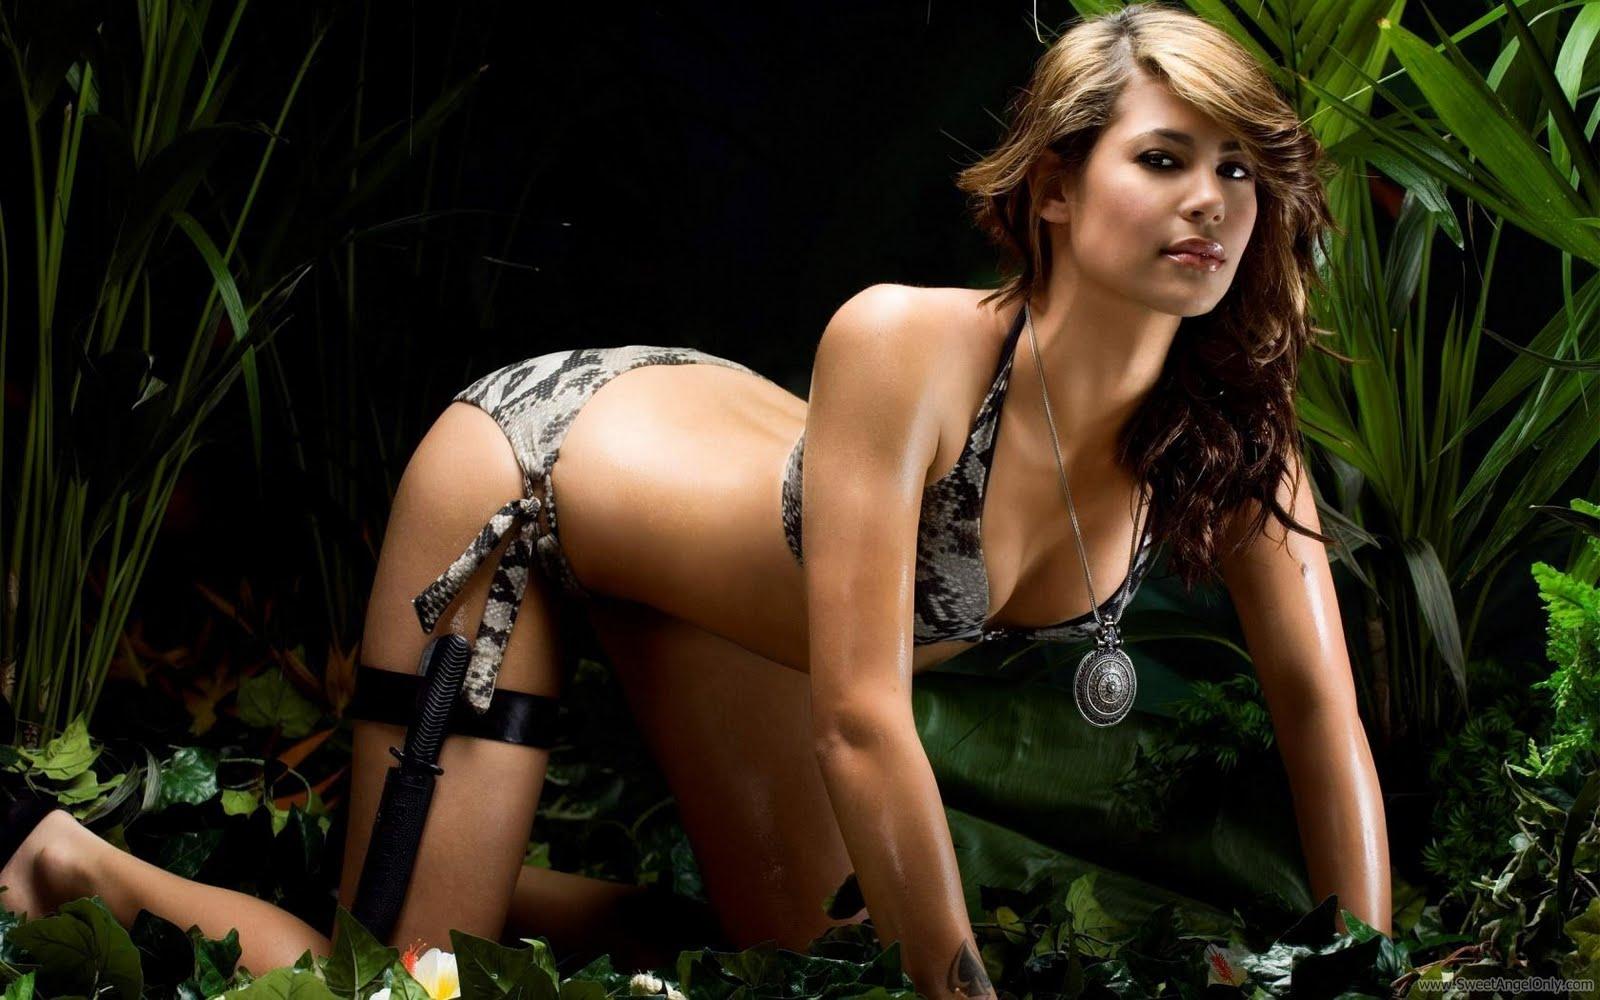 http://3.bp.blogspot.com/-bSZvaqEWHuM/TsDcGx4NfCI/AAAAAAAAA2Q/X89vruar6xU/s1600/karima_adebibe_hot_in_jungle-1680x1050.jpg